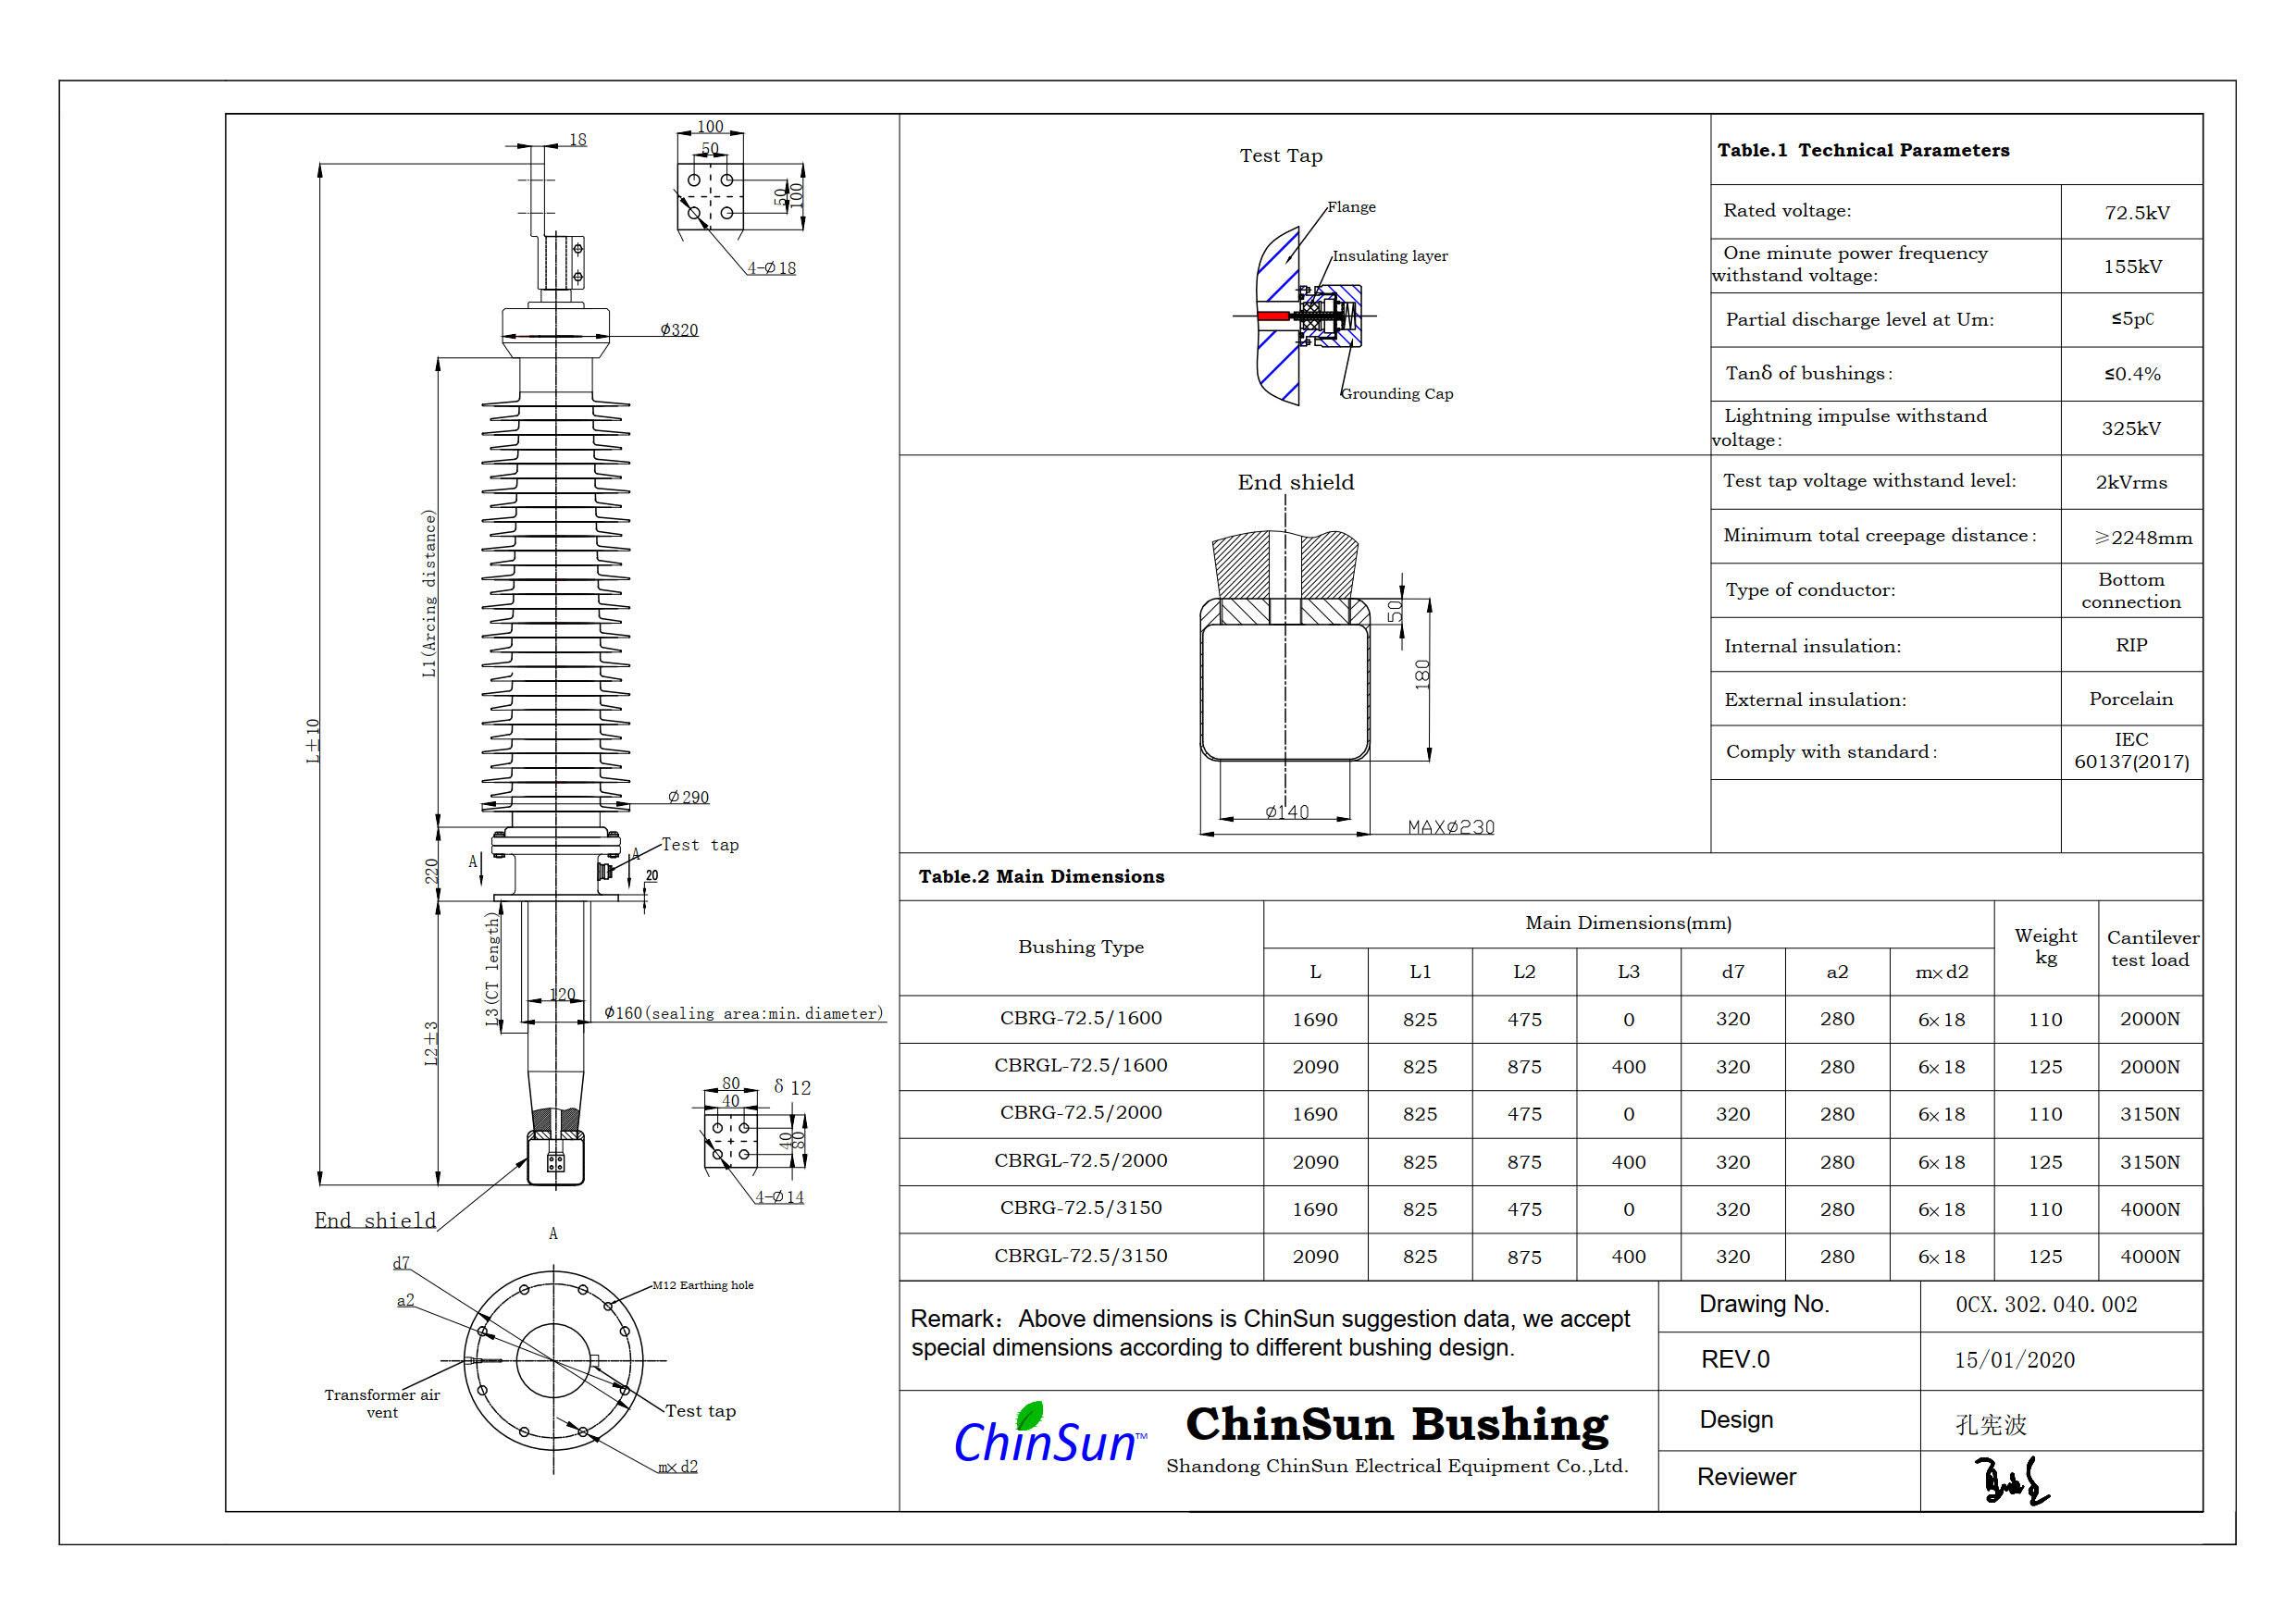 Drawing-transformer bushing-72.5kV_Porcelain-BC-ChinSun